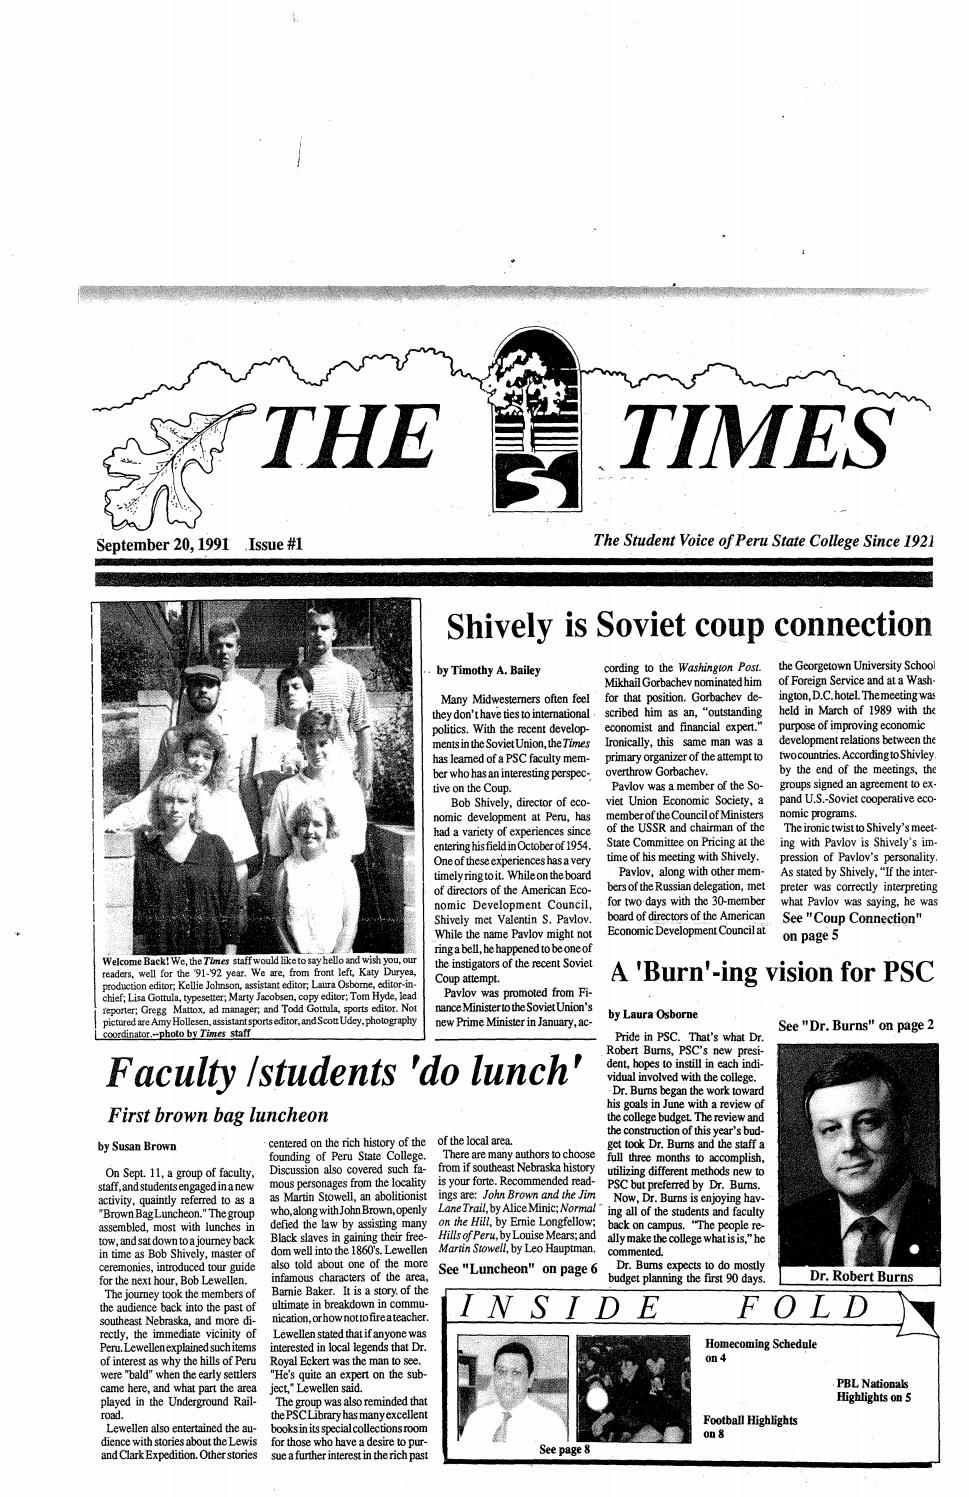 b9573cdf7f 1991-1992 The Times (Peru, NE) - issues 1-12 by Peru State College Library  - issuu